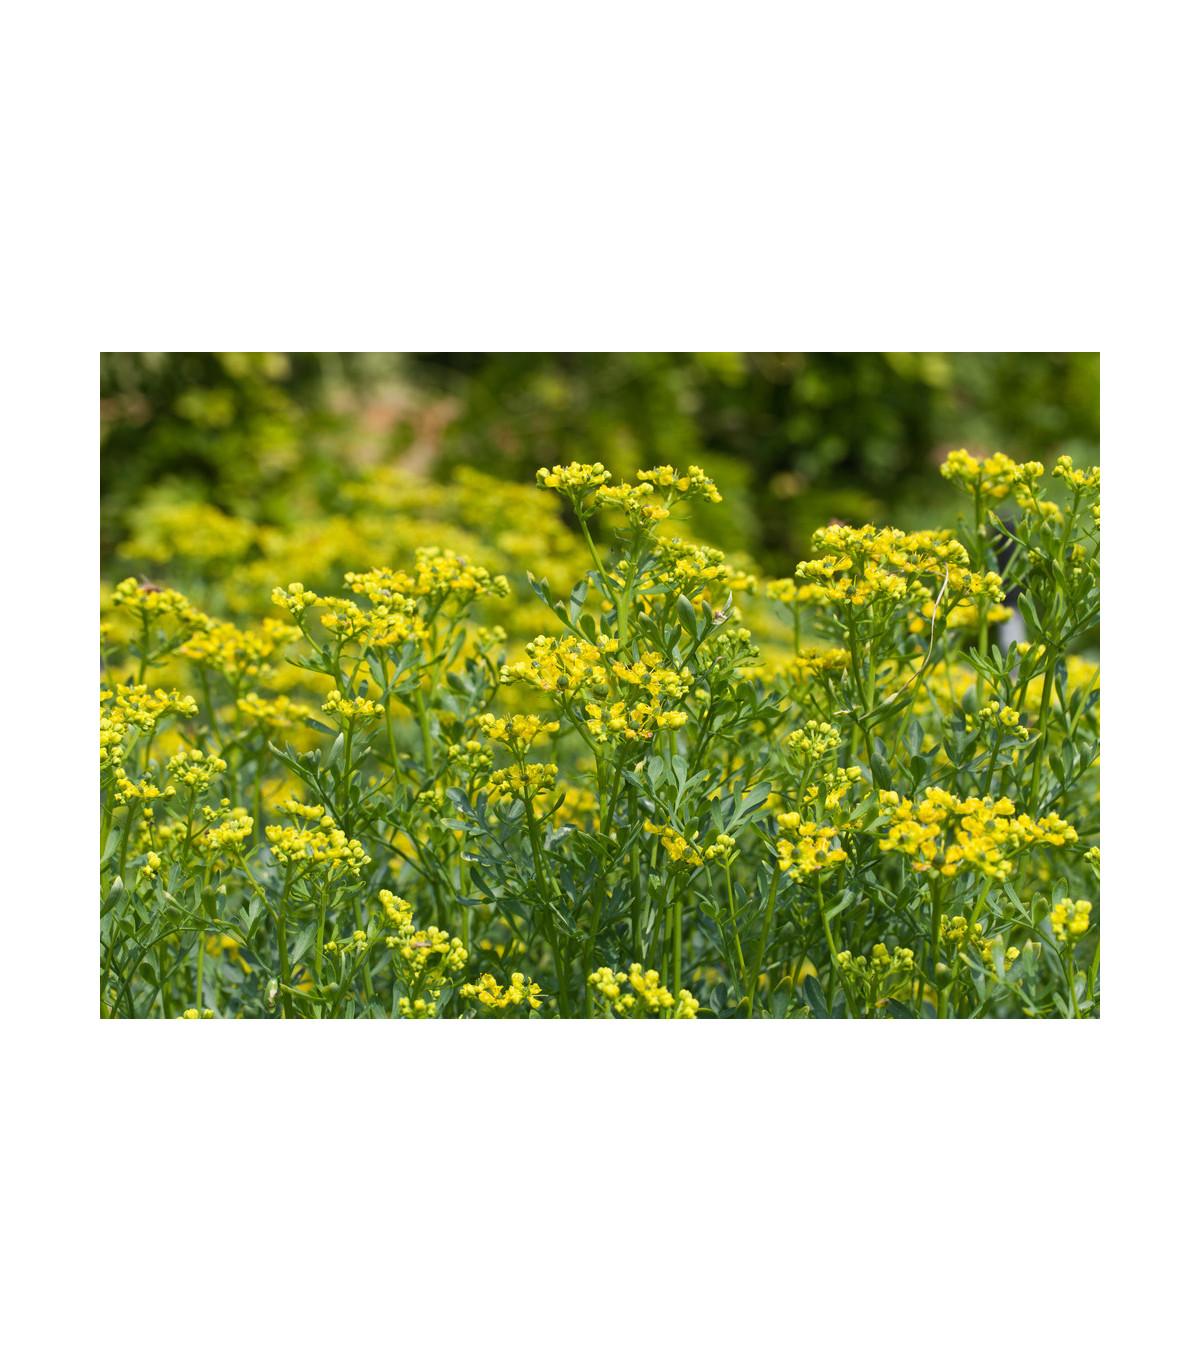 Ruta vonná - Ruta graveolens - predaj semien ruty - 10 ks